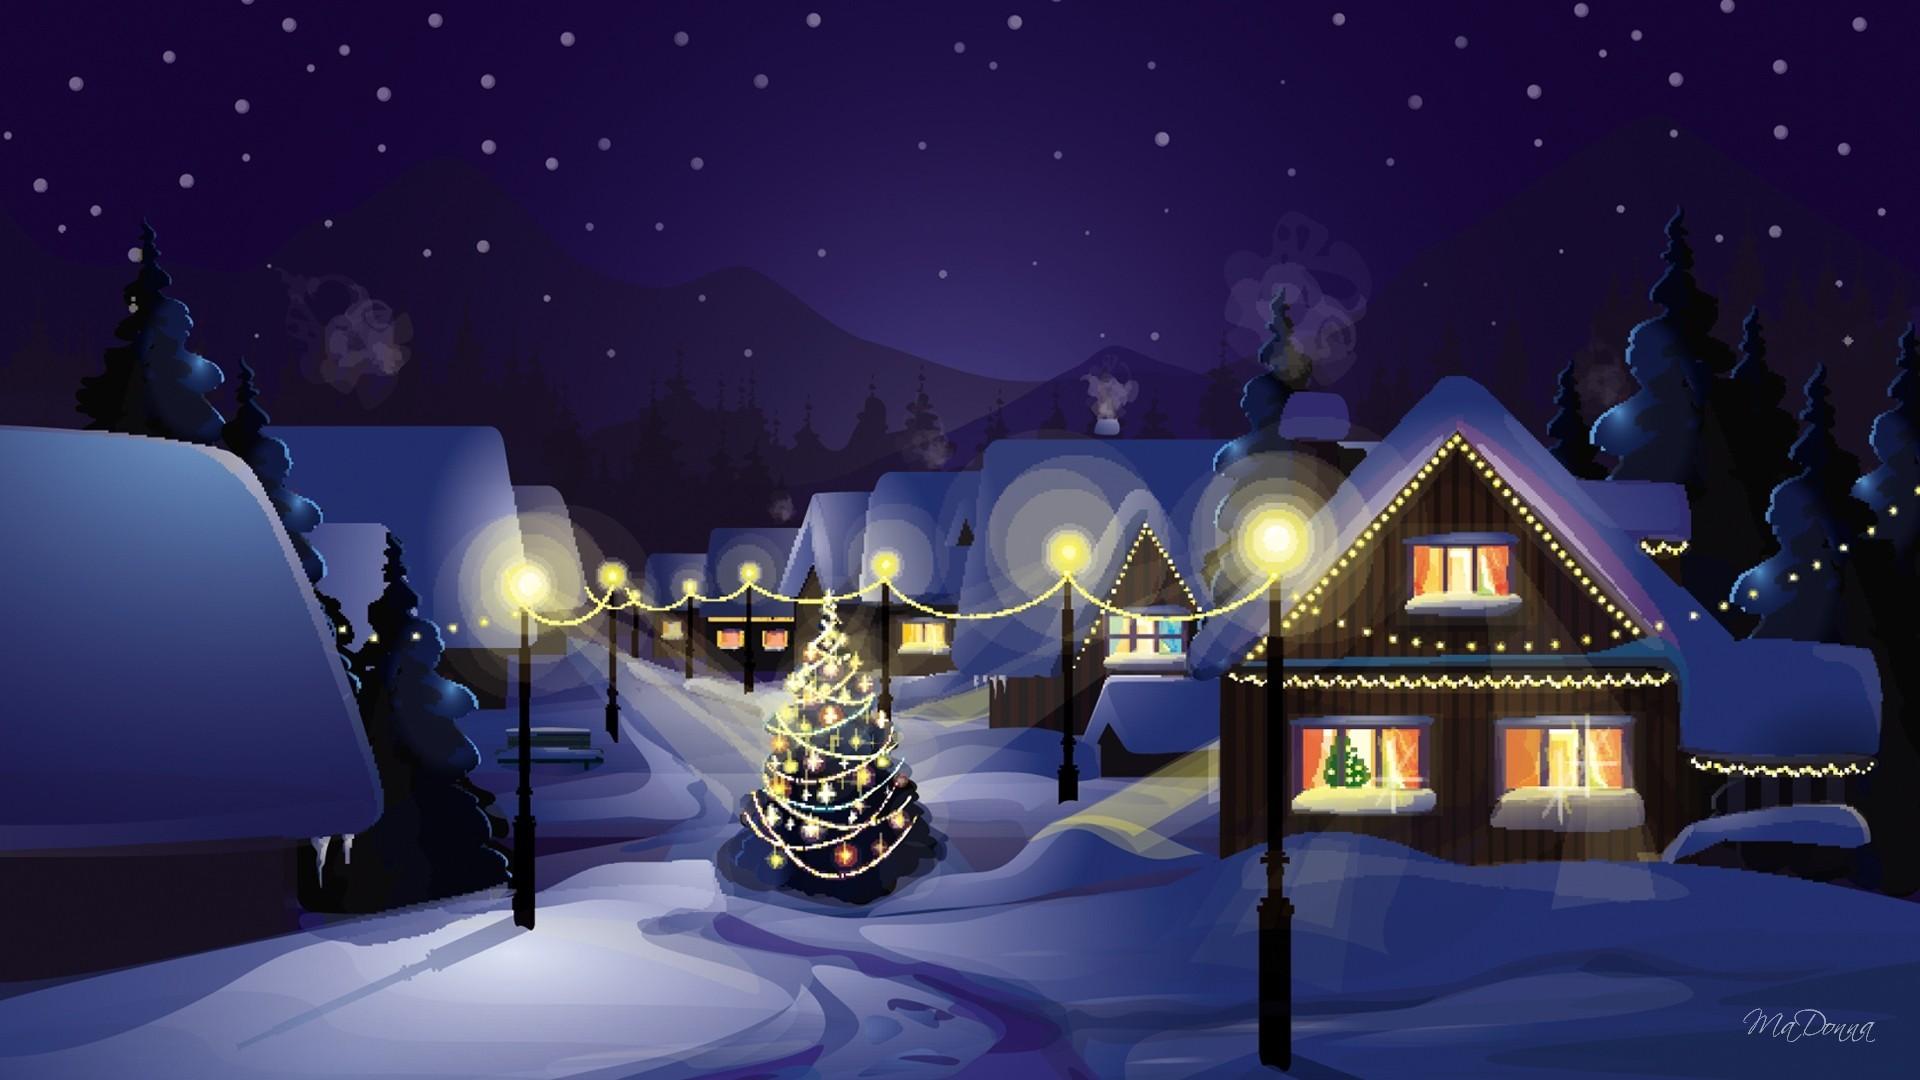 Ipad Christmas Wallpaper Hd: Lights Desktop Background ·① WallpaperTag